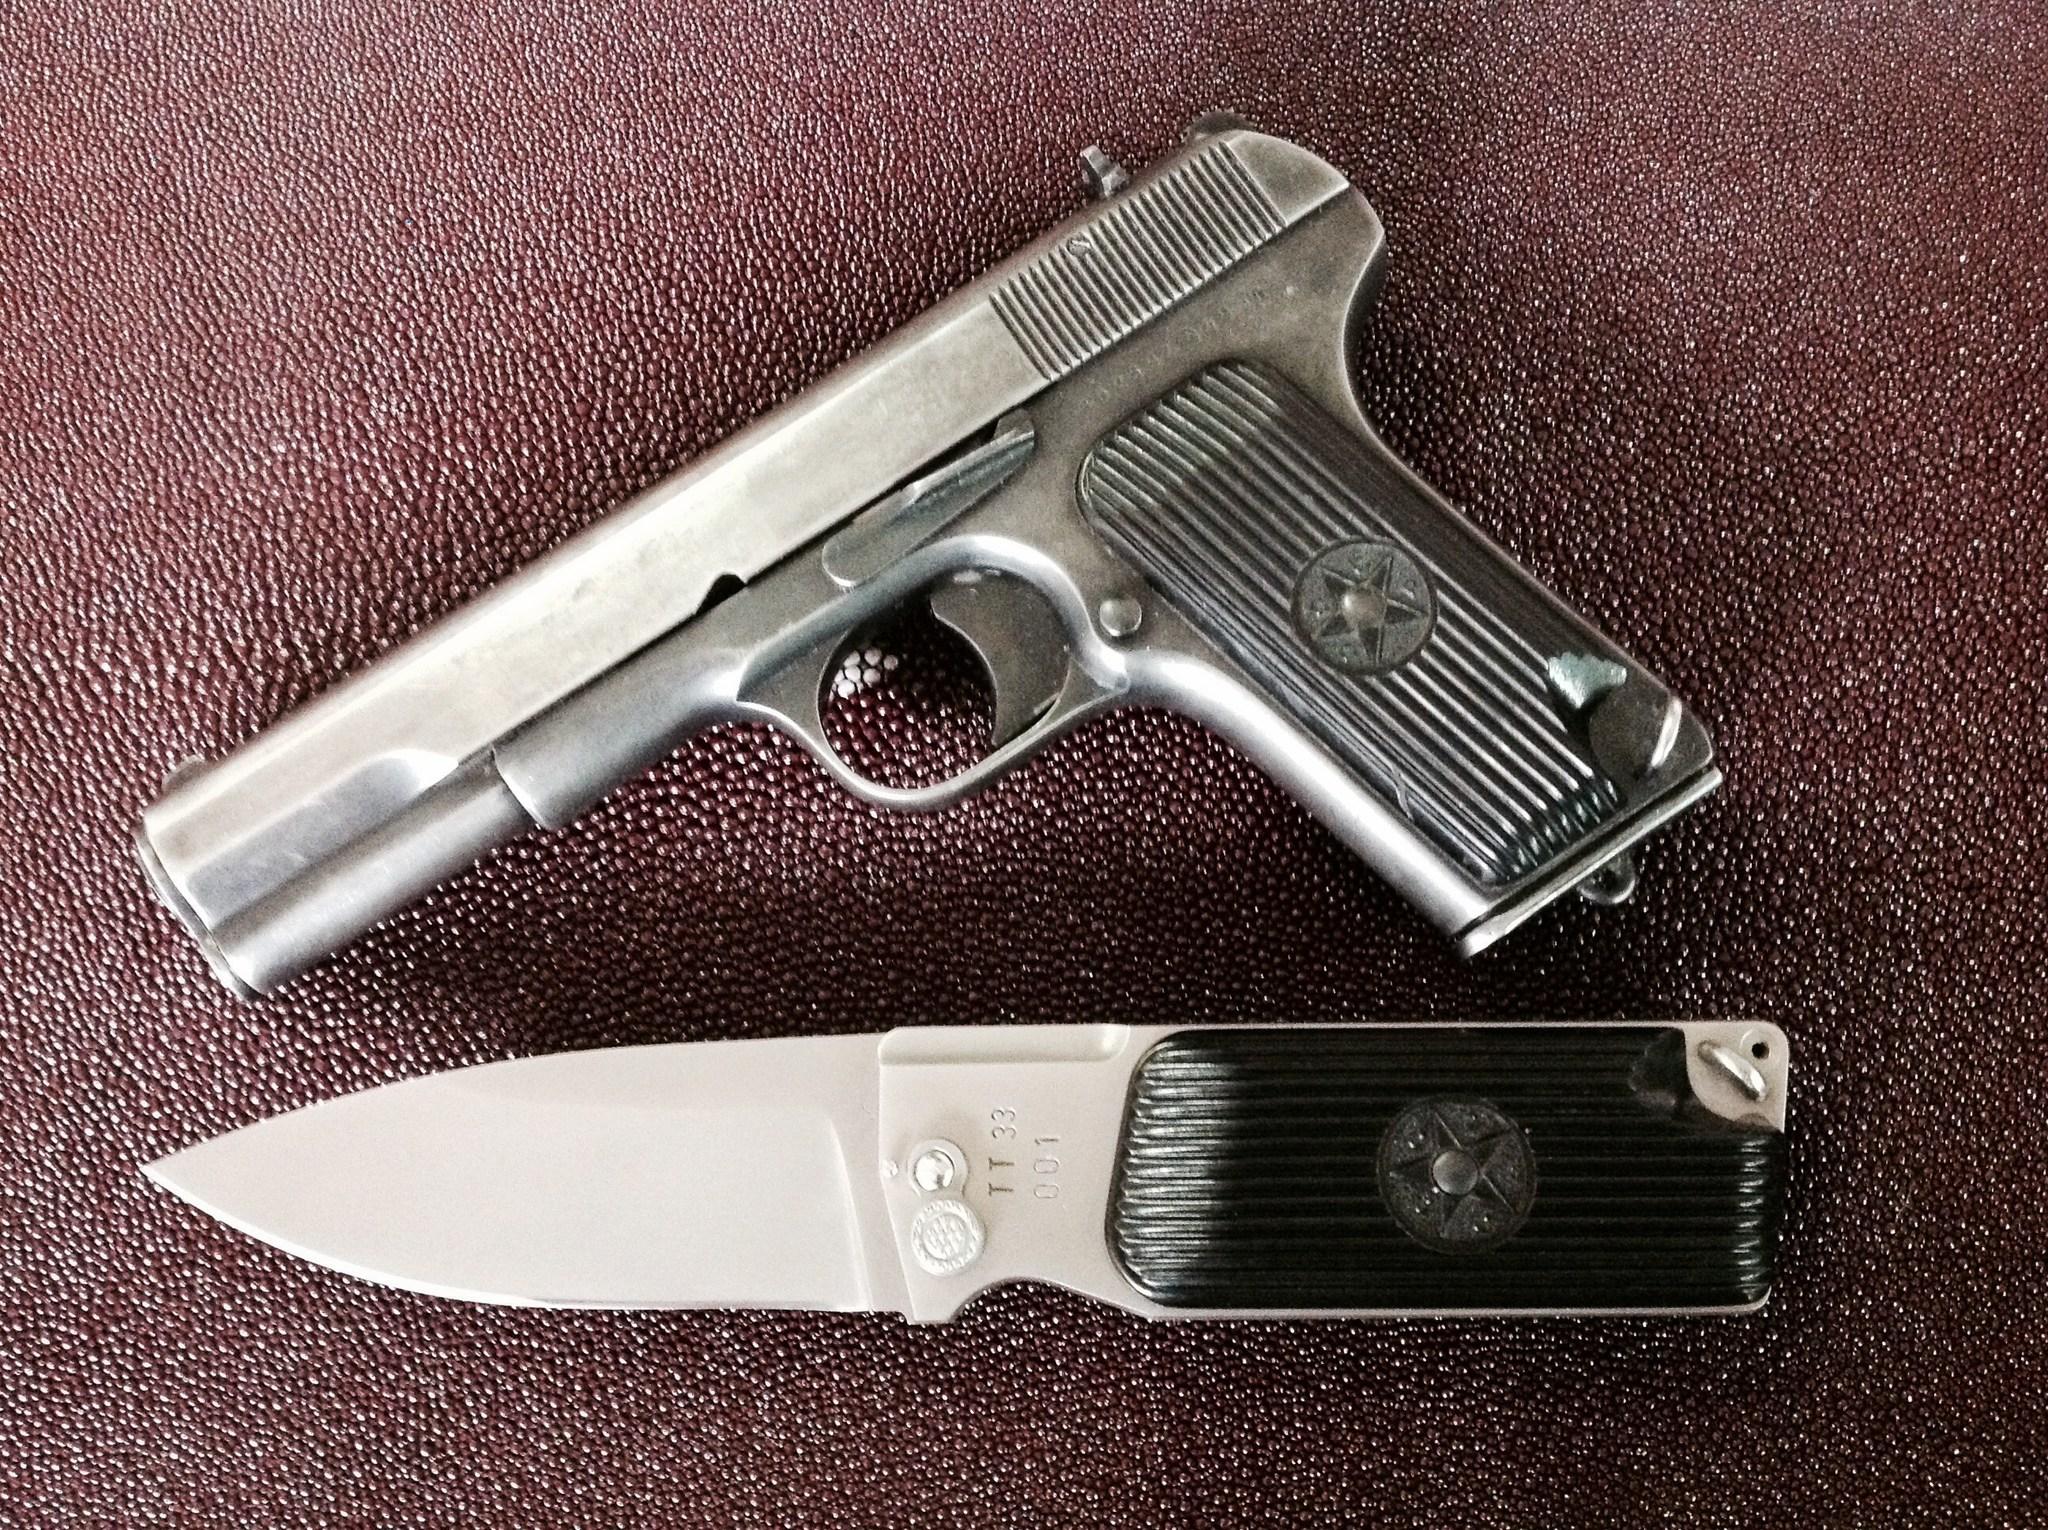 Нож Уракова А.И. Т-3 440С - фотография